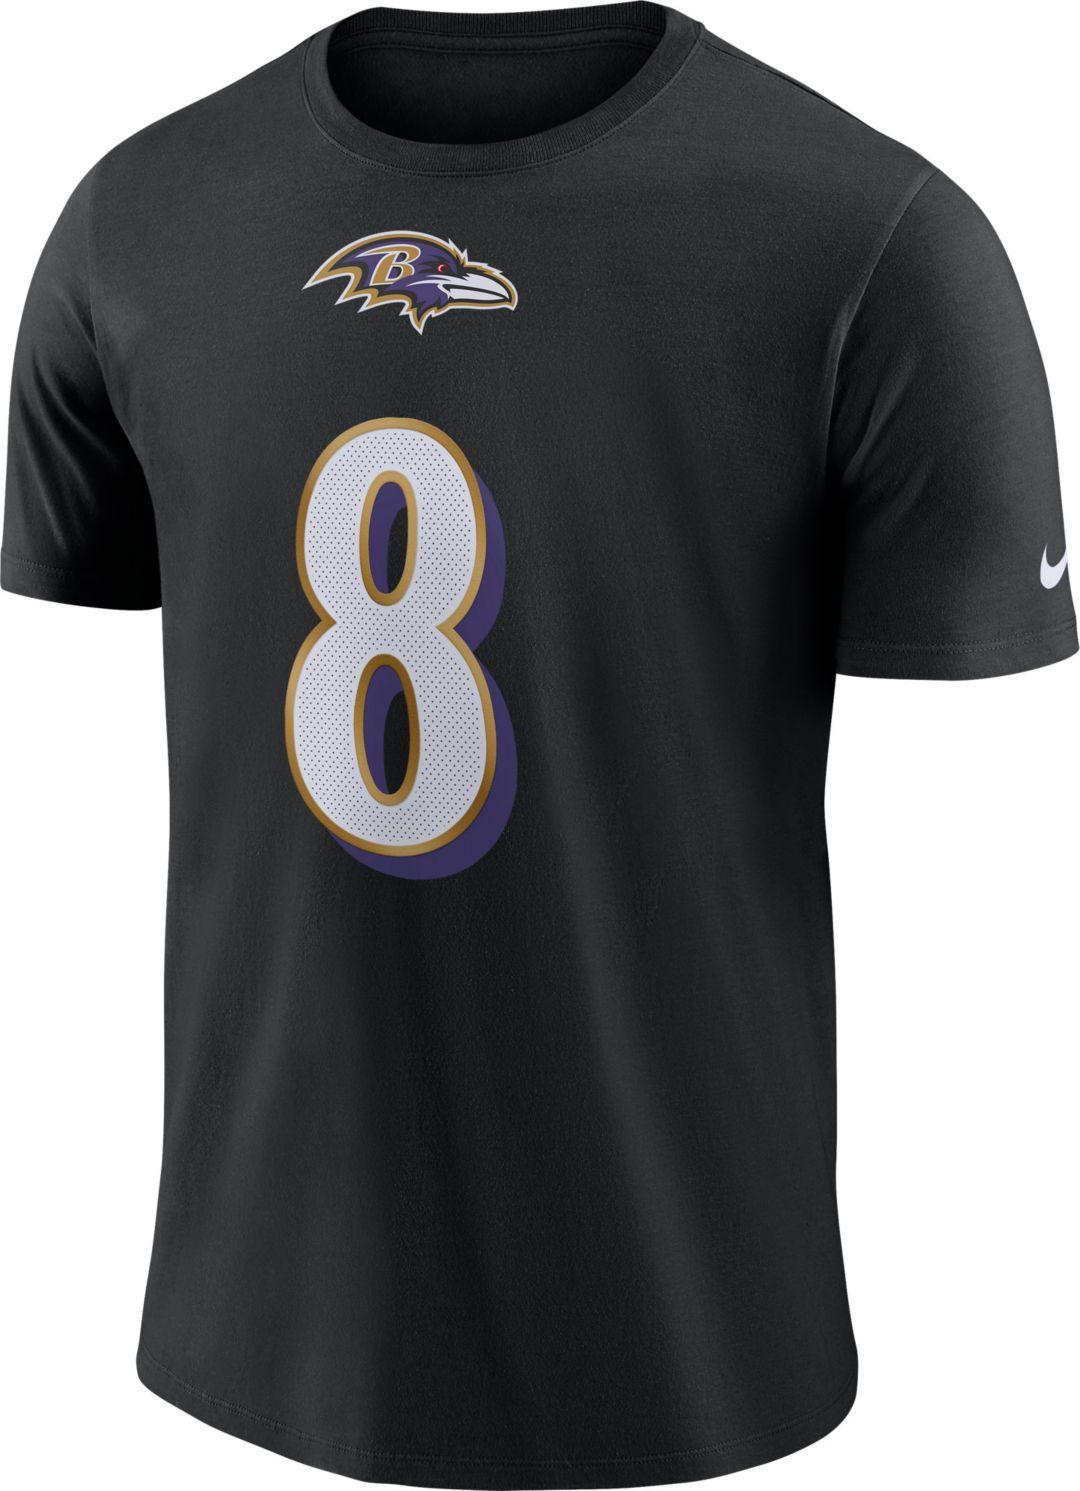 buy online 642e0 24cc5 Nike Men's Baltimore Ravens Lamar Jackson #8 Pride Logo Black T-Shirt